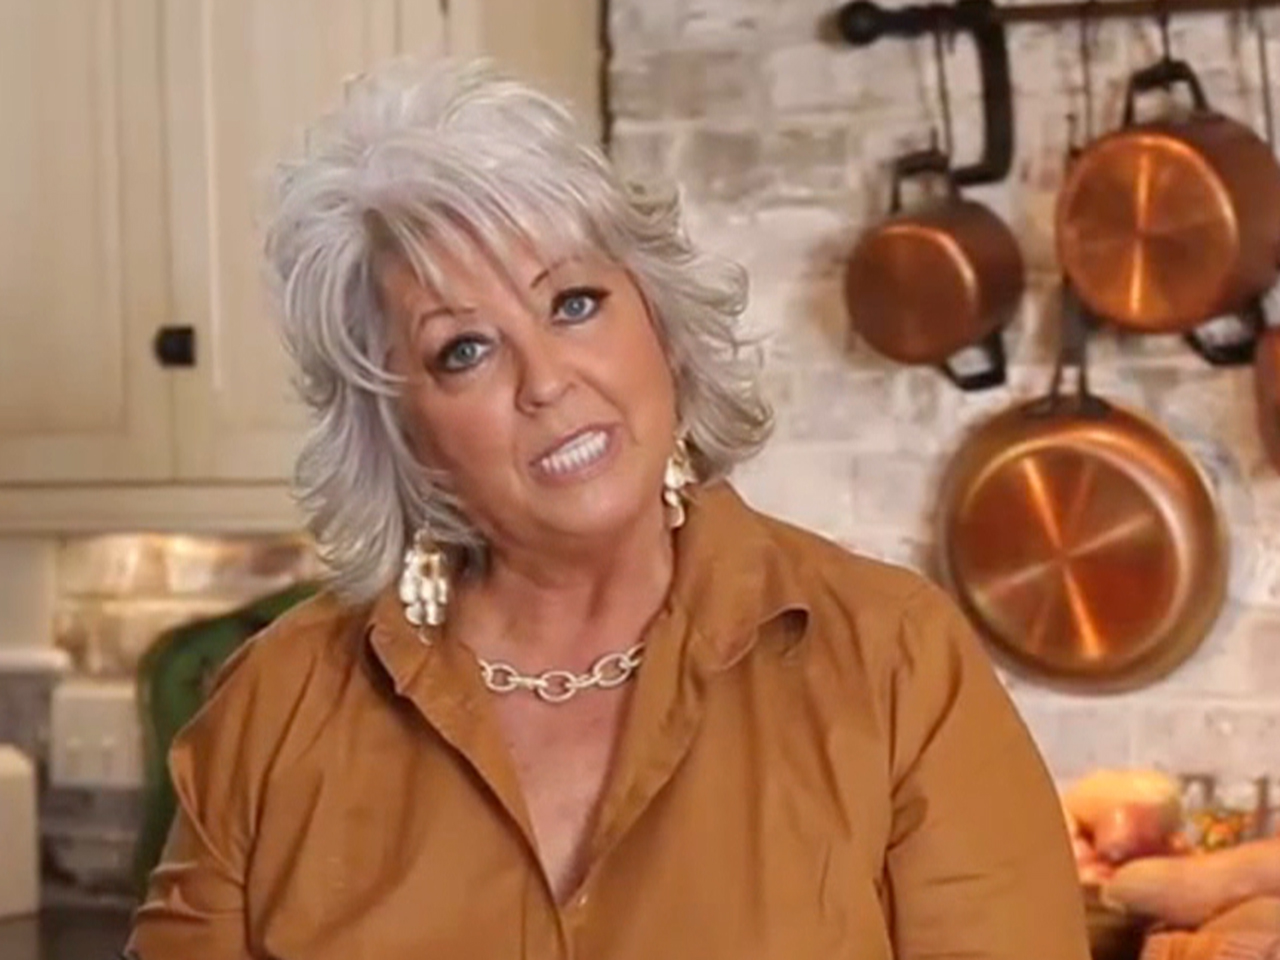 Paula Deen axes longtime agent after fallout